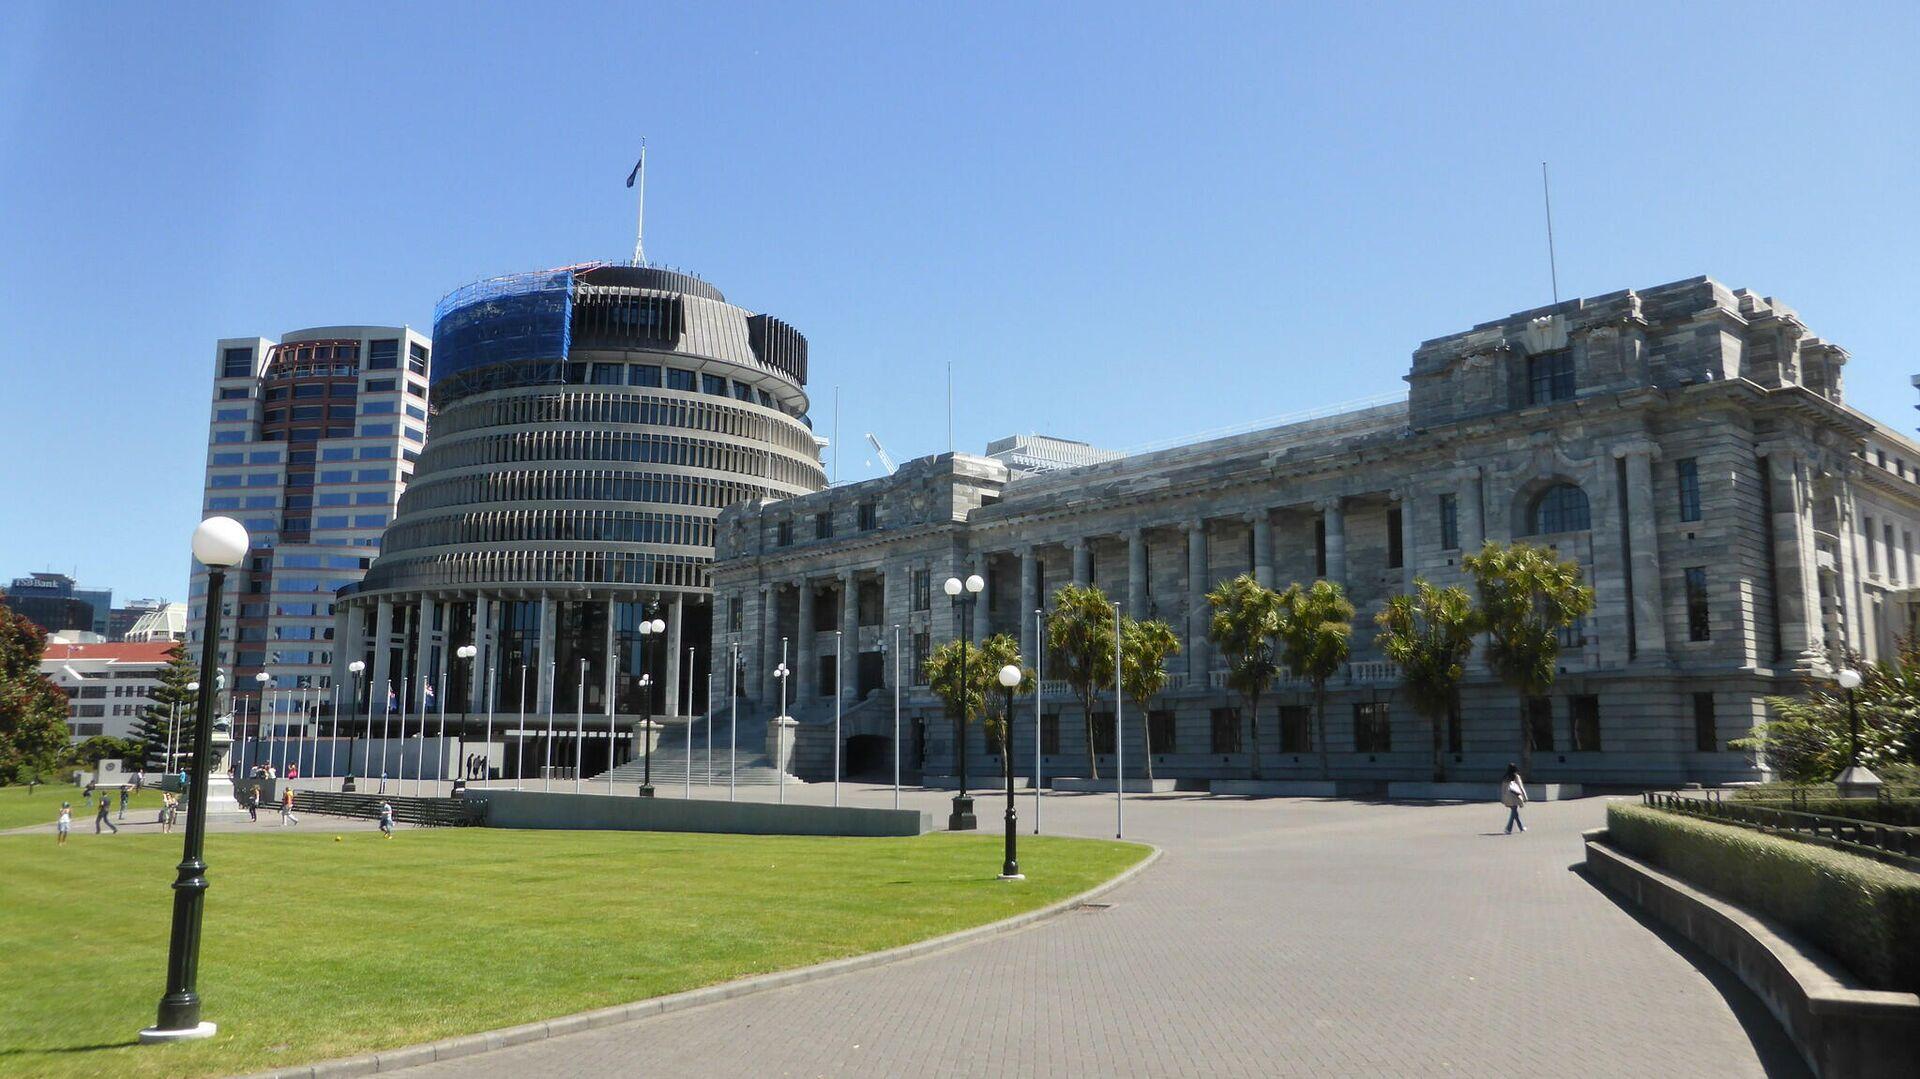 Здание парламента Новой Зеландии - РИА Новости, 1920, 02.12.2020